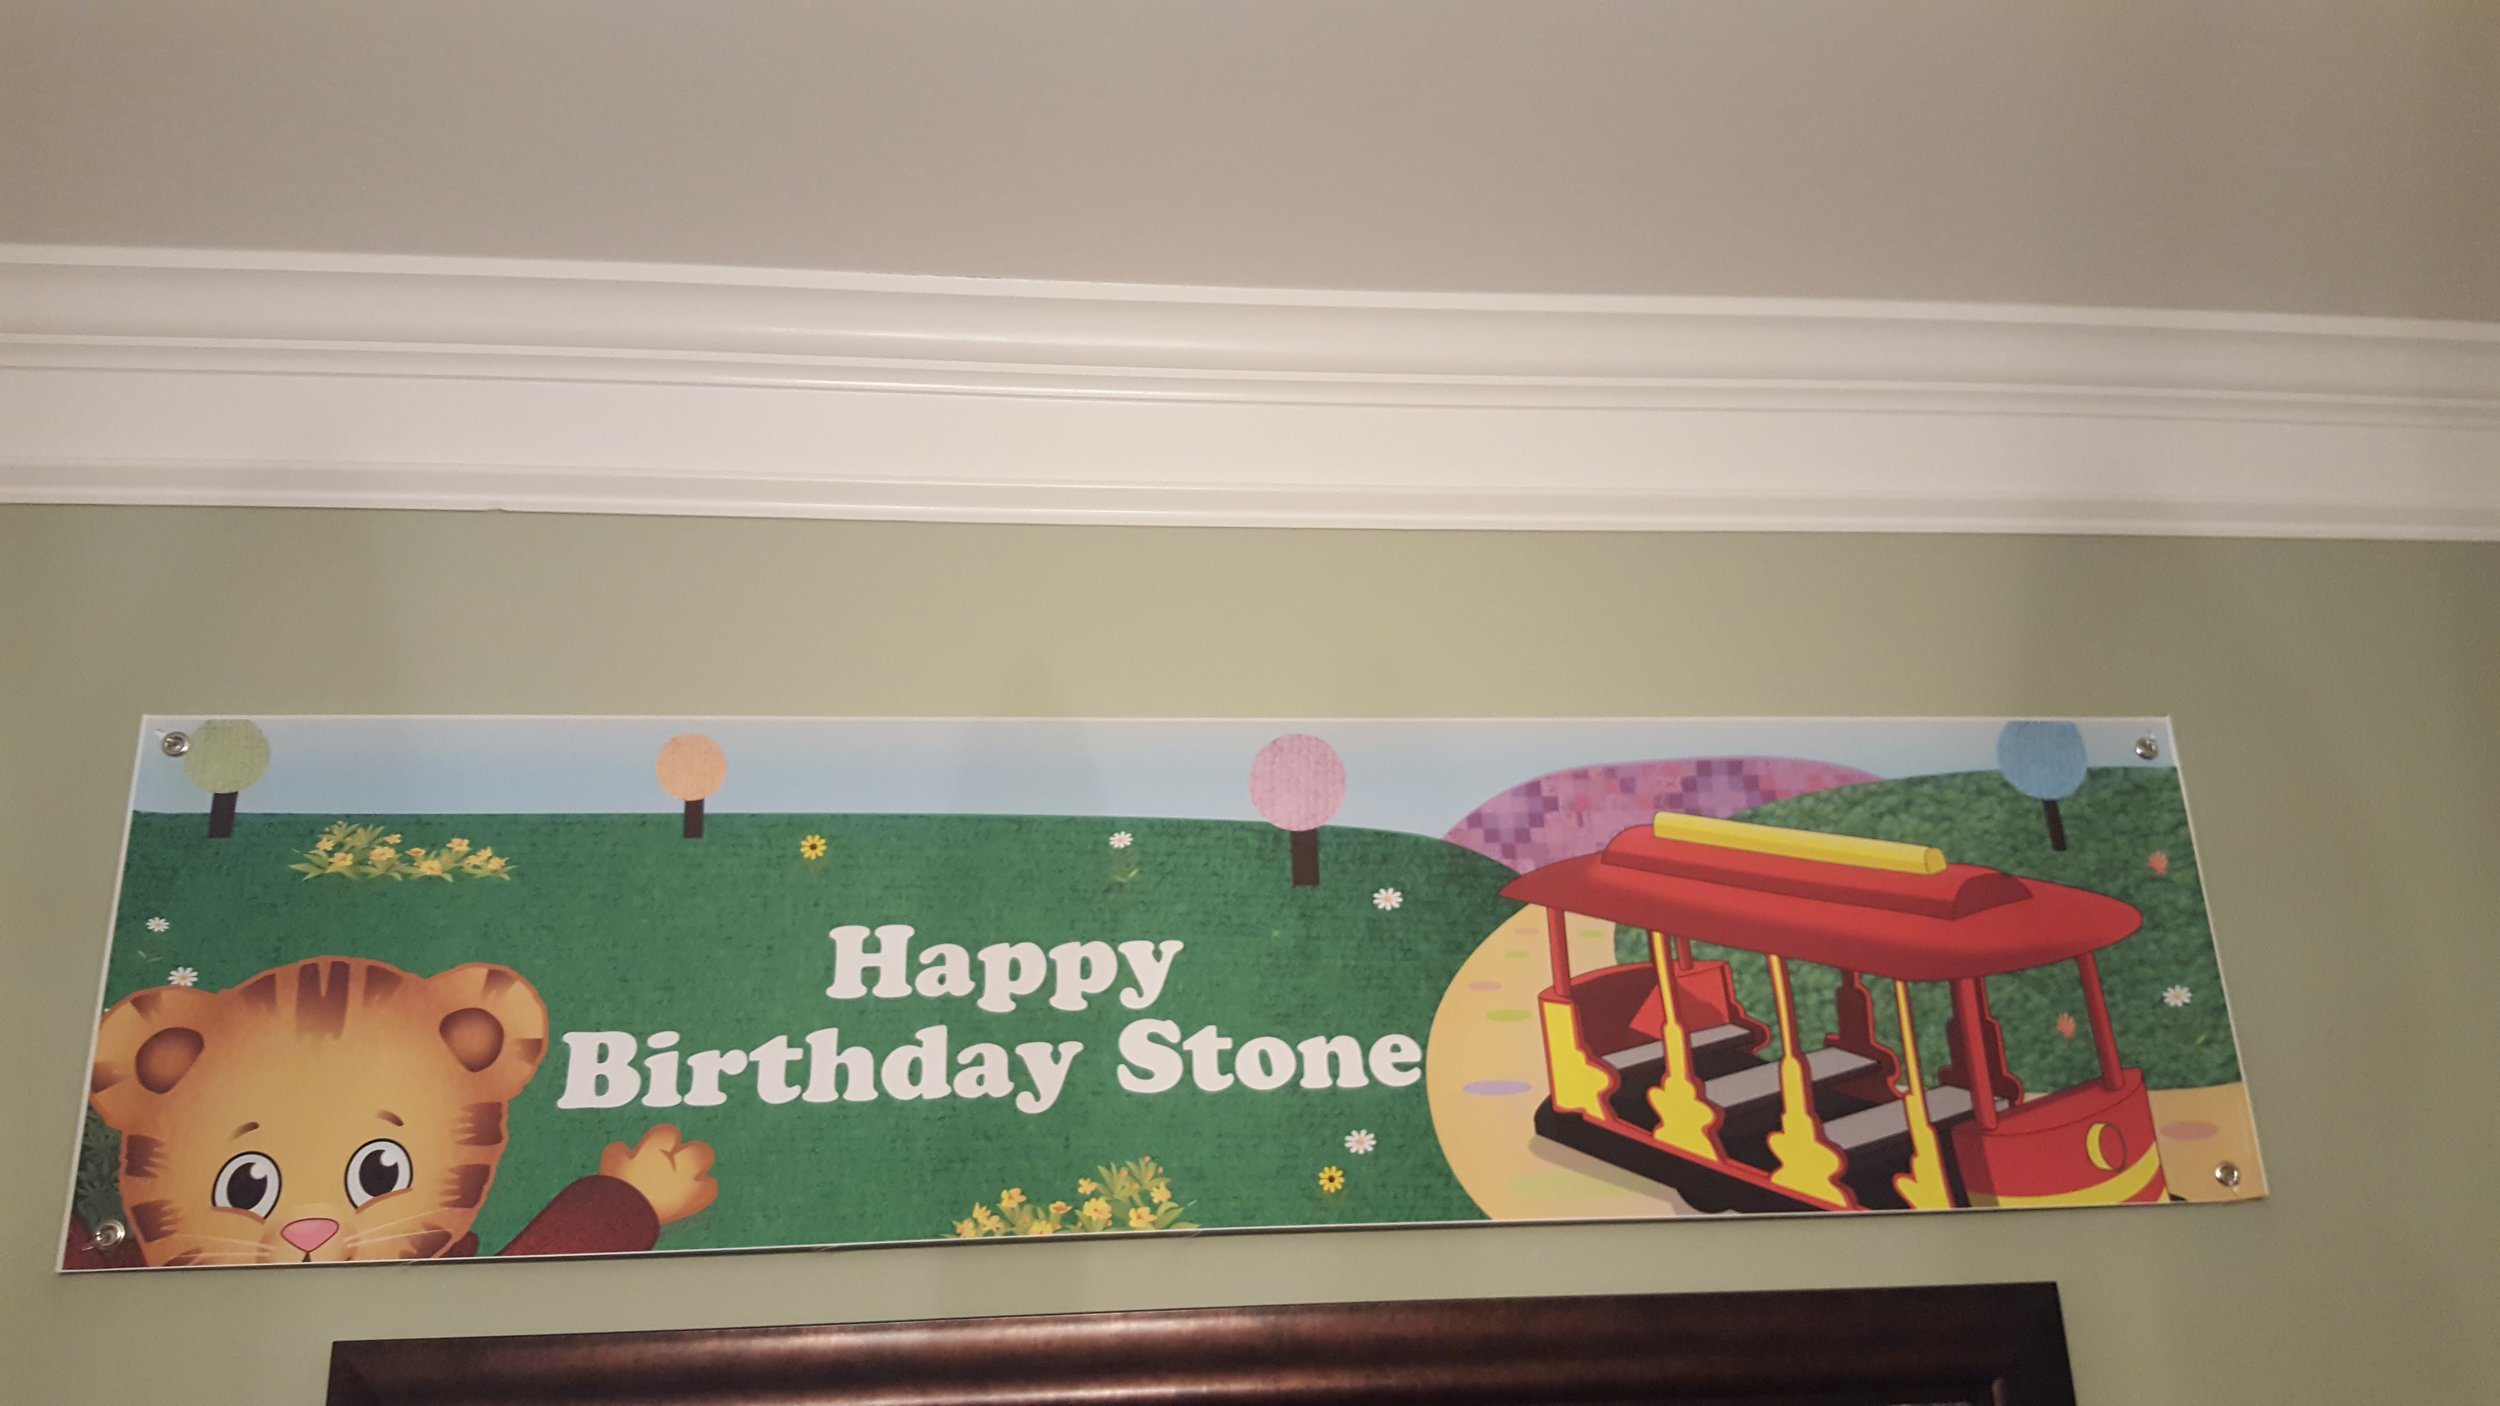 Birthday Sign from birthdayinabox.com